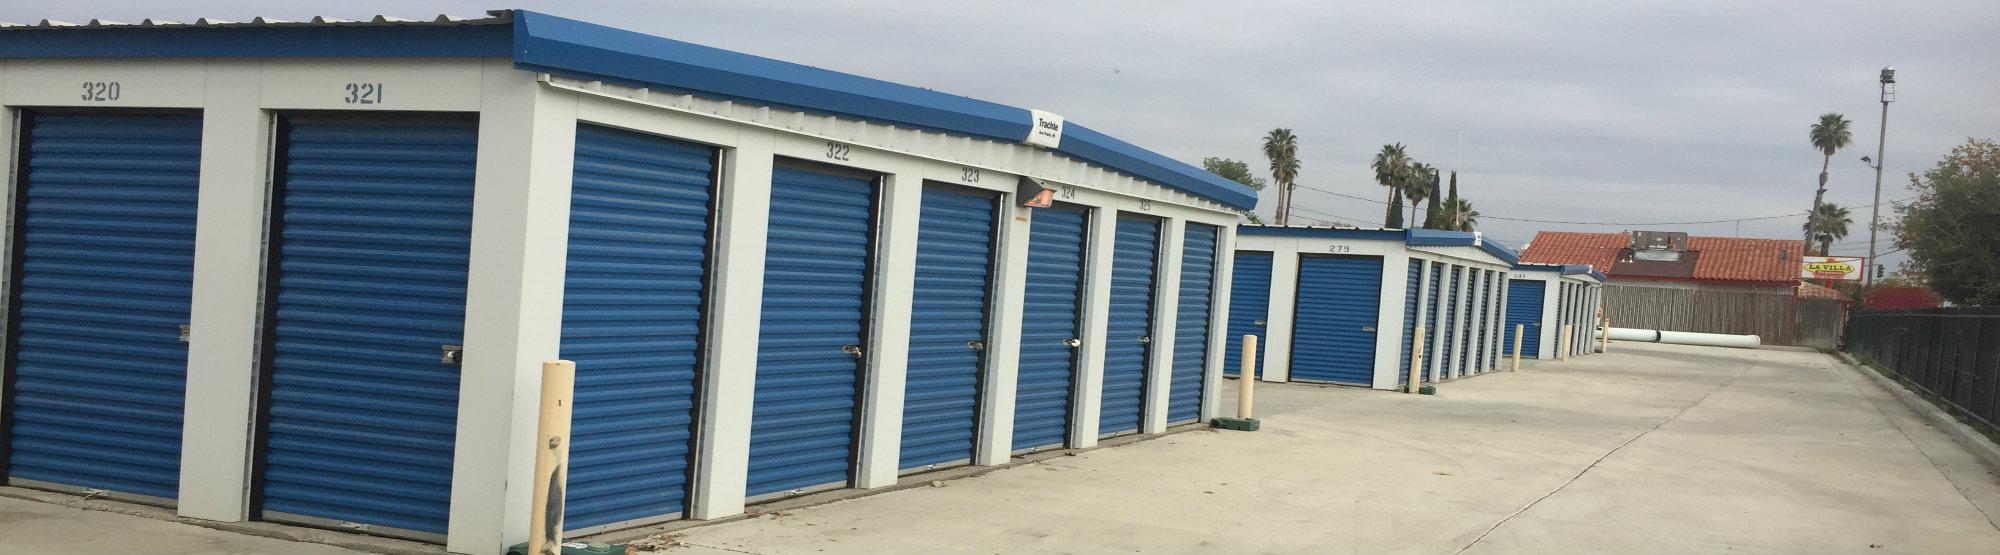 Rows of self storage units in Bakersfield, CA